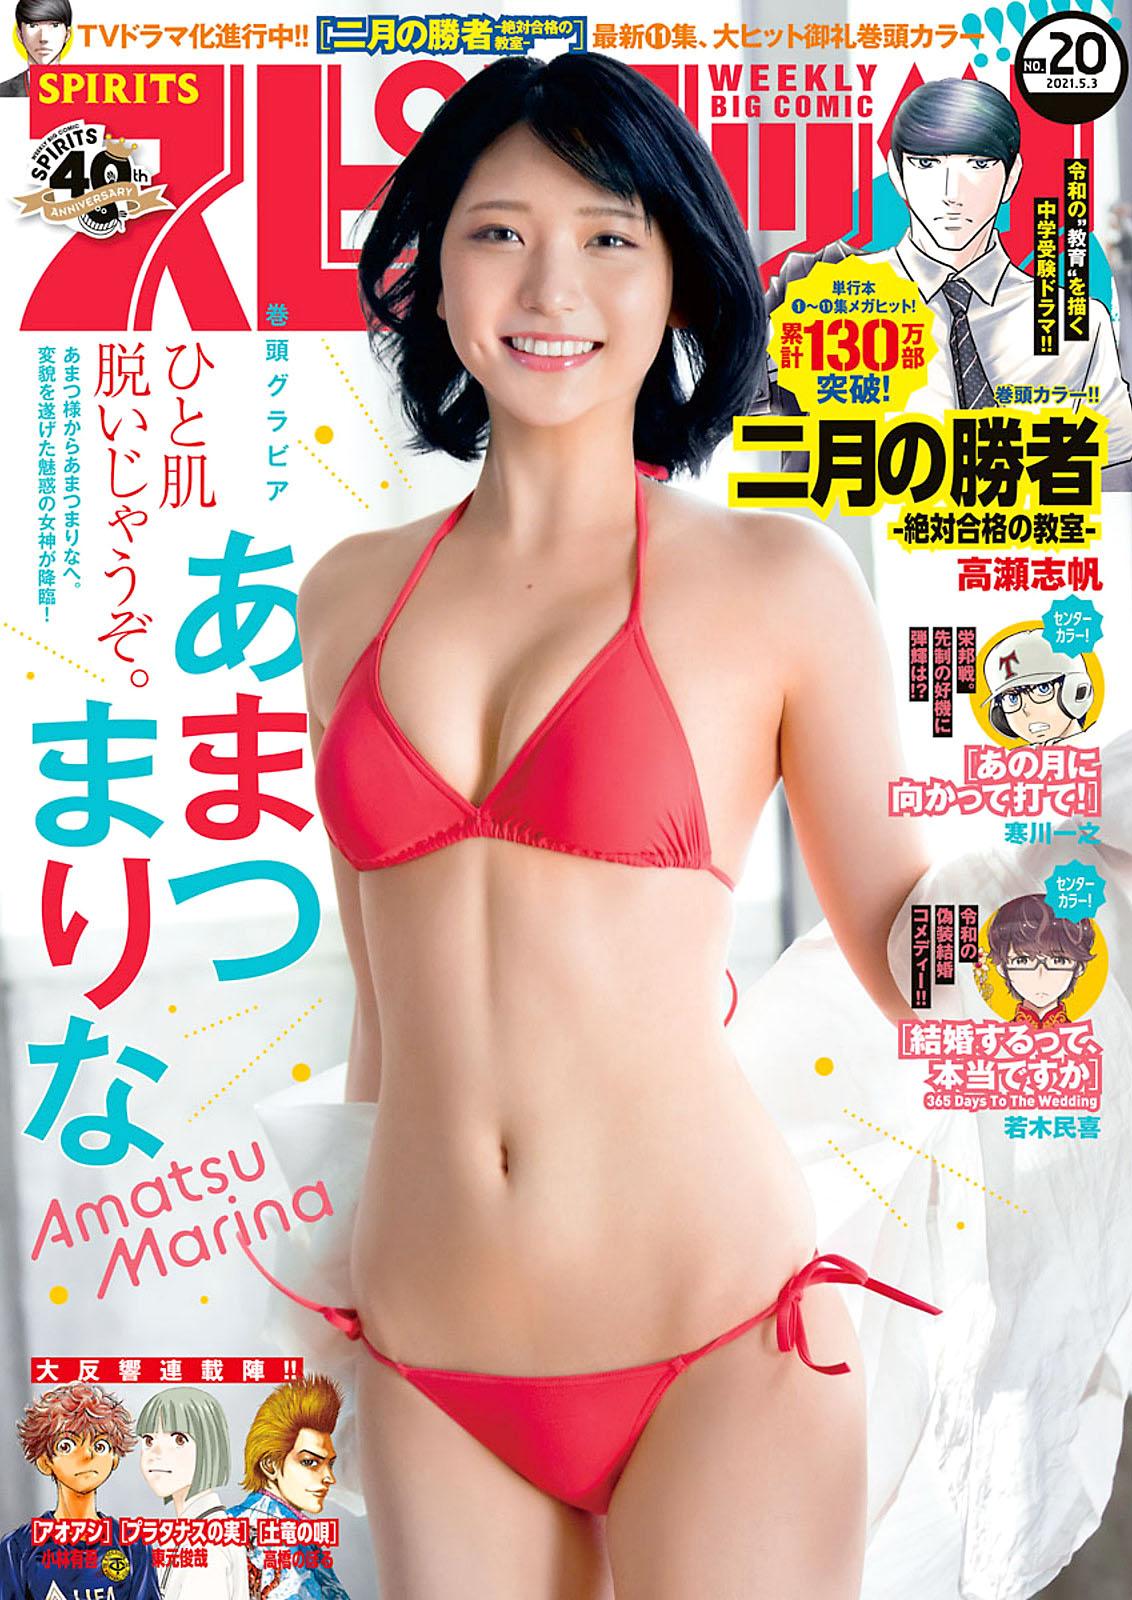 Sama Amatsu Big Comic Spirits 210503 01.jpg